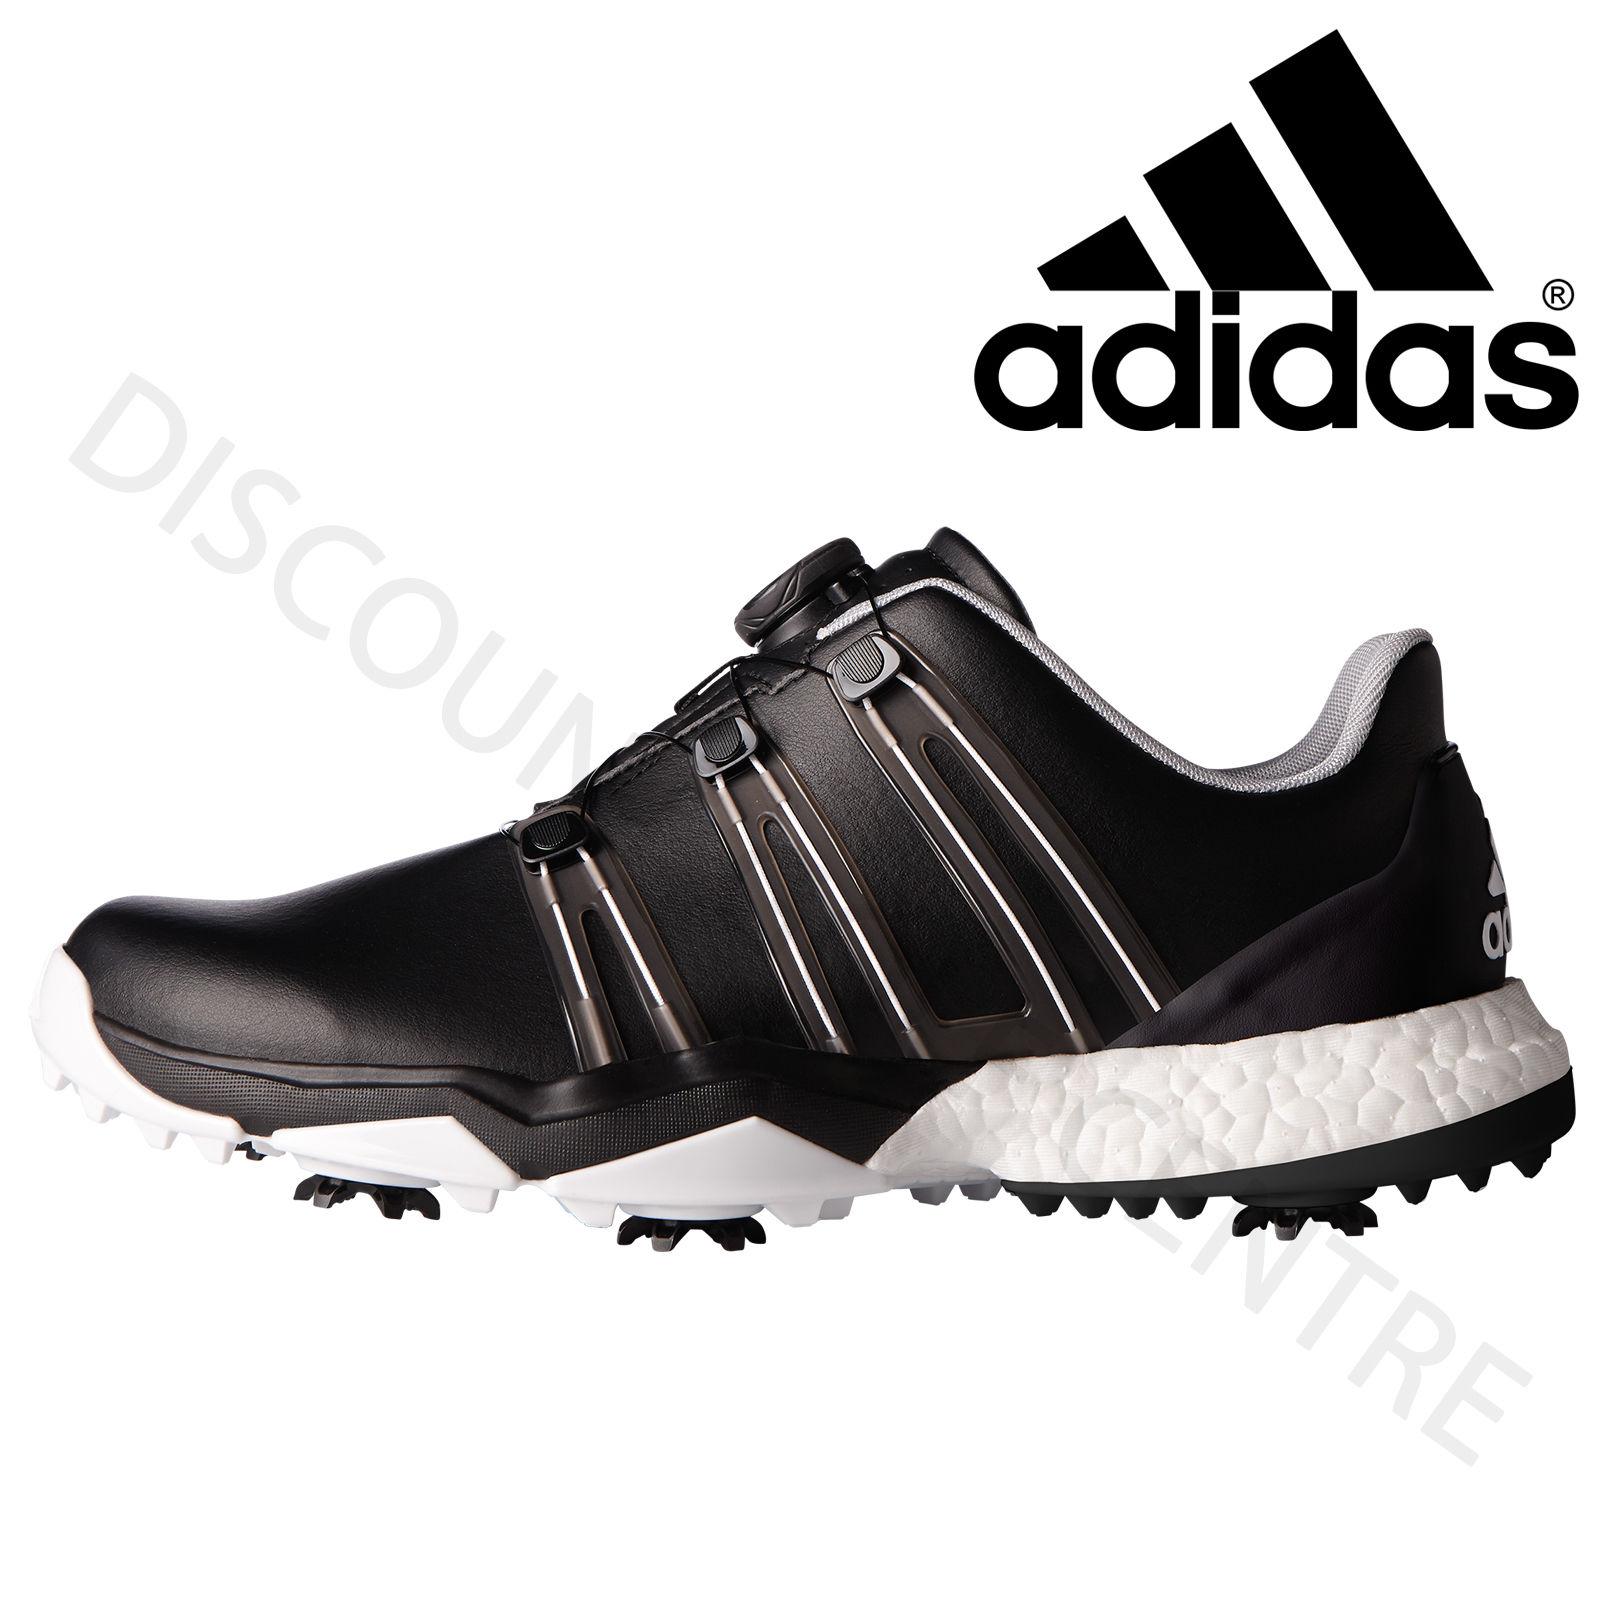 Adidas Men S Powerband Boa Boost Golf Shoe